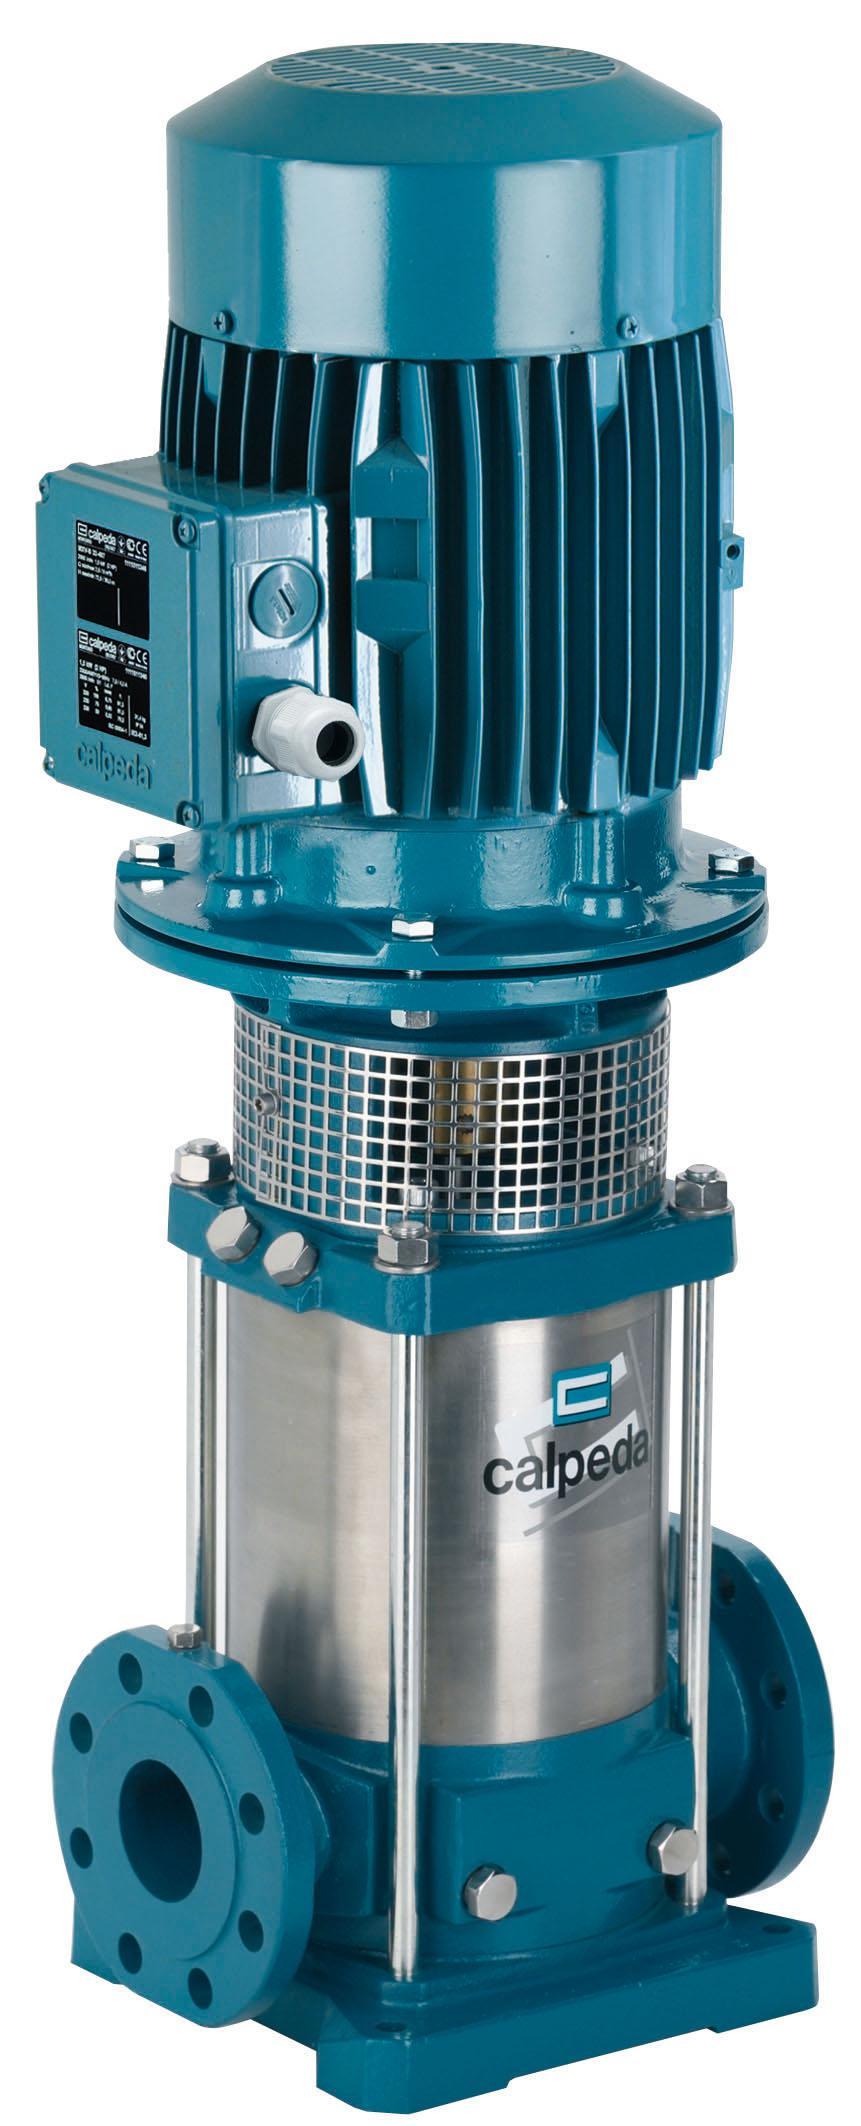 Насос Calpeda Mxv 50-1606/c 400/690/50 hz m132 v1-5.5t